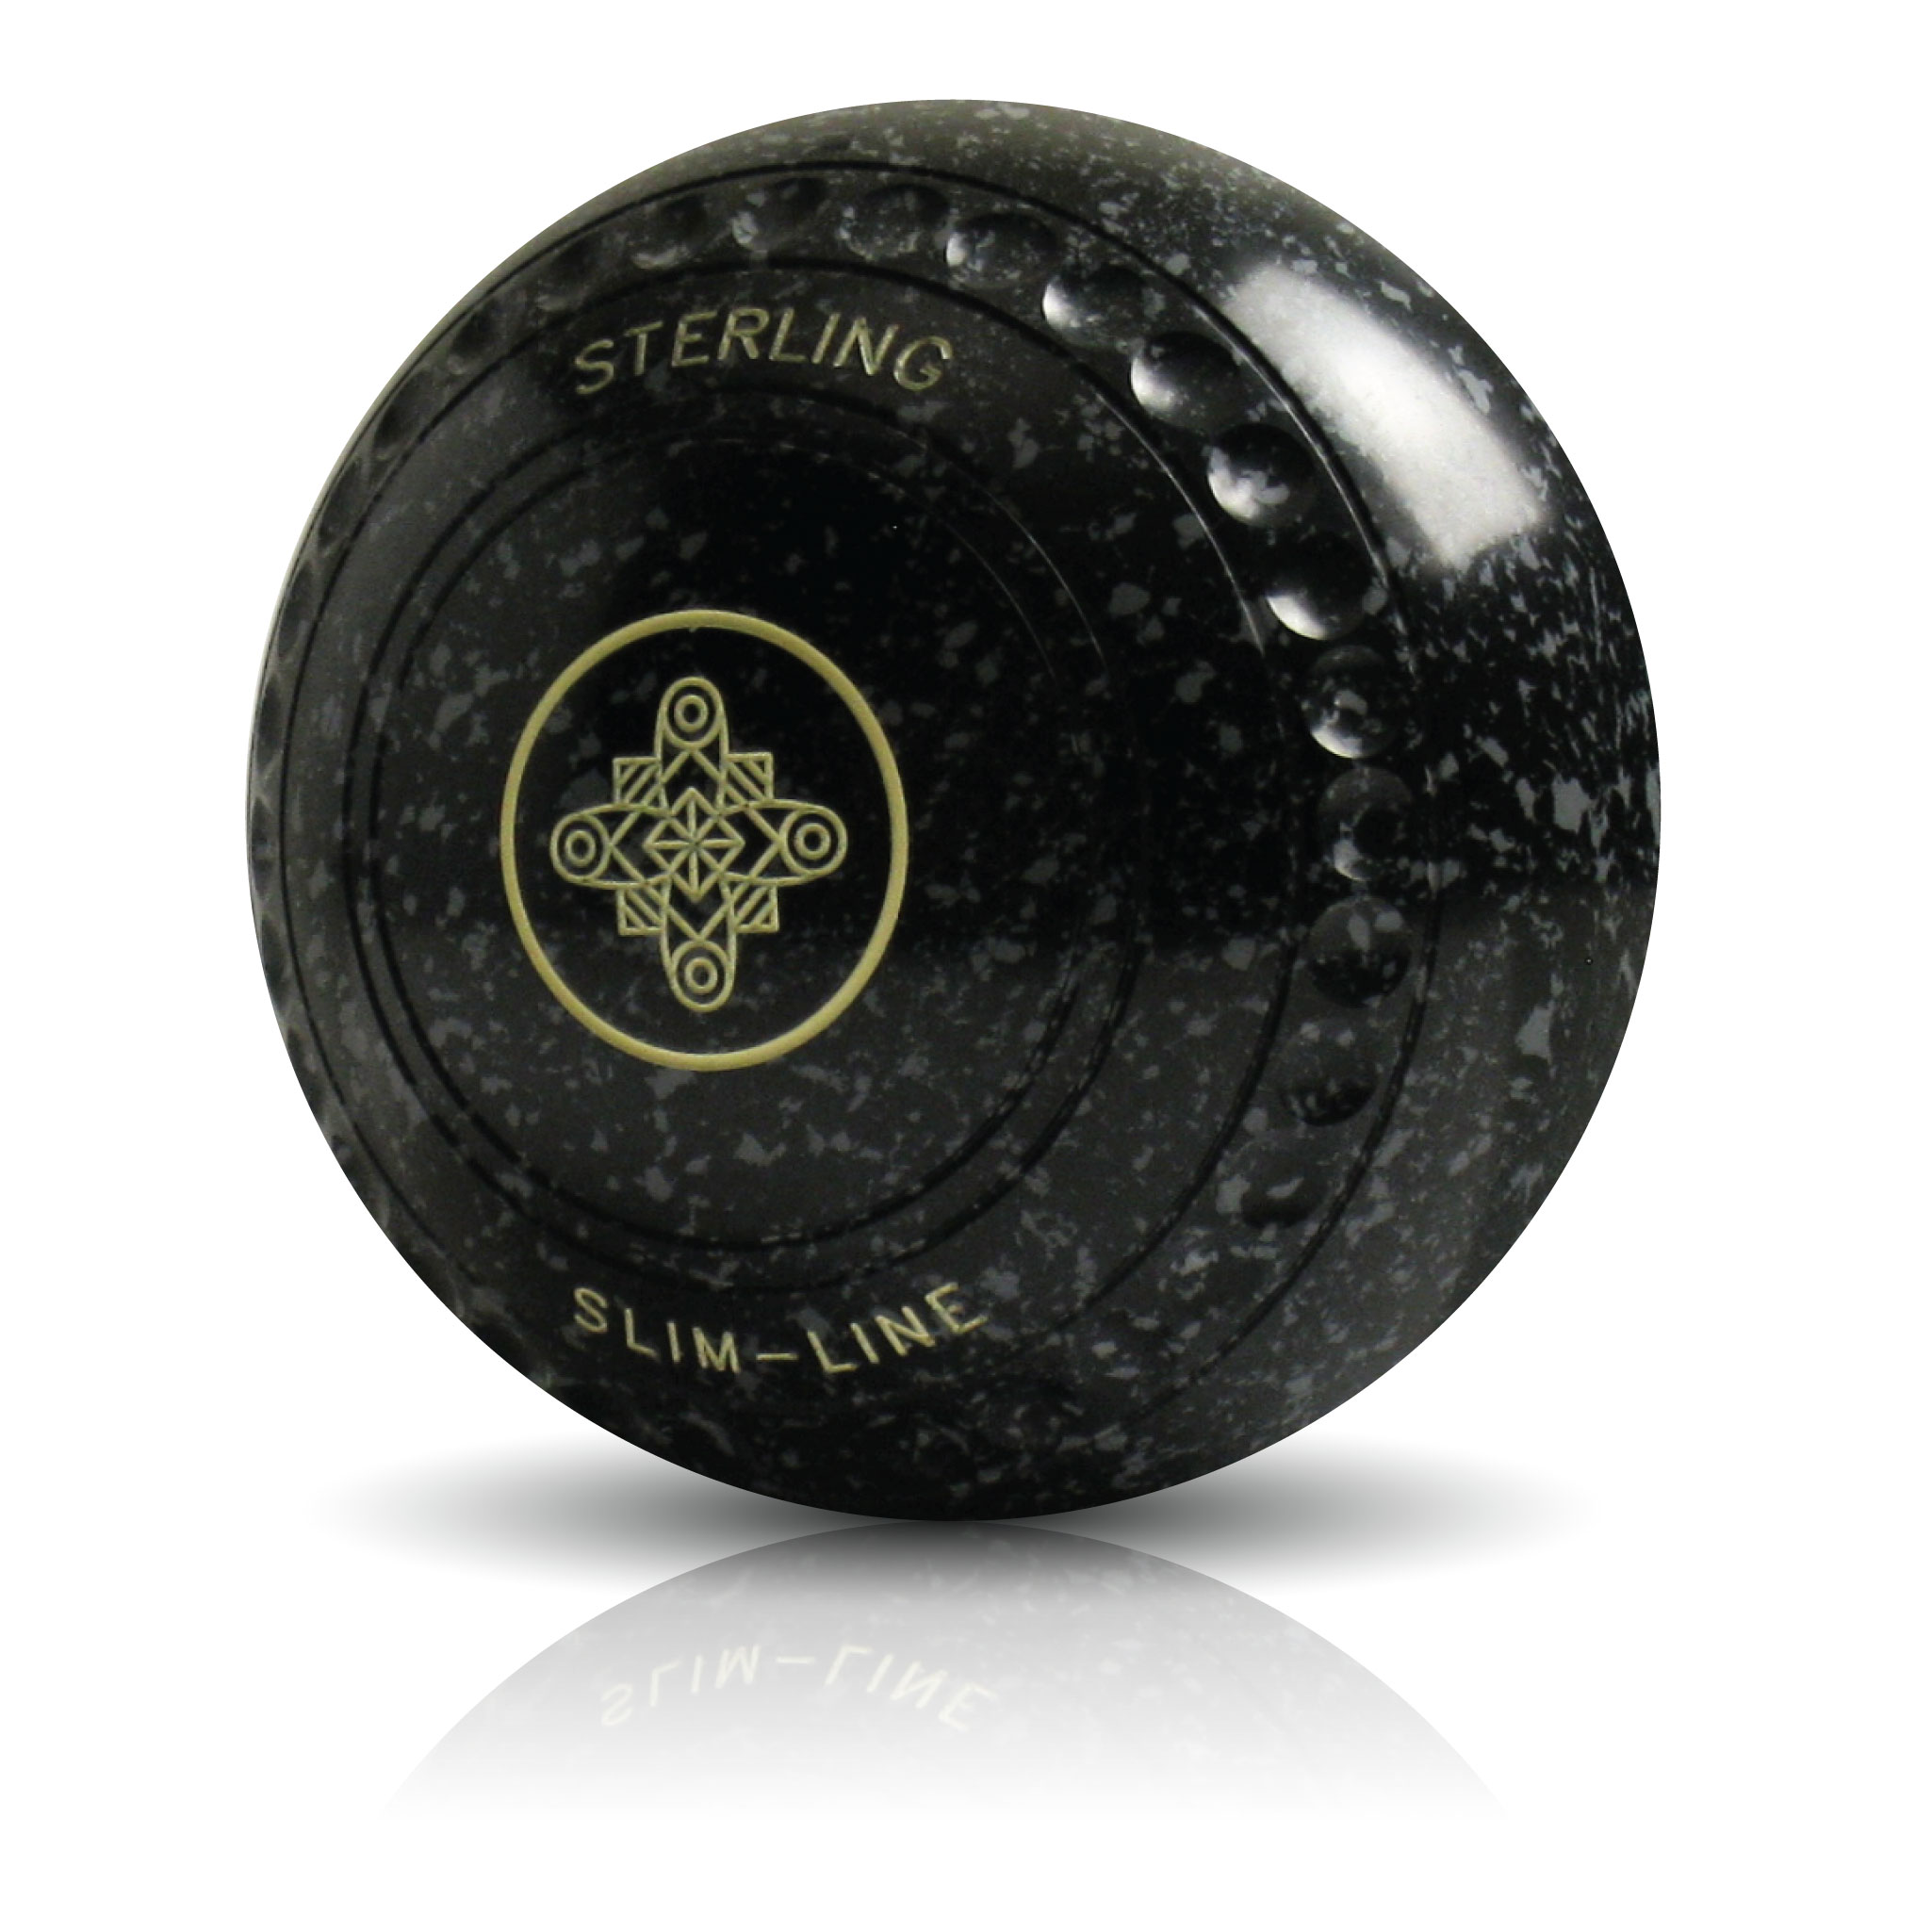 Almark Sterling Slimline